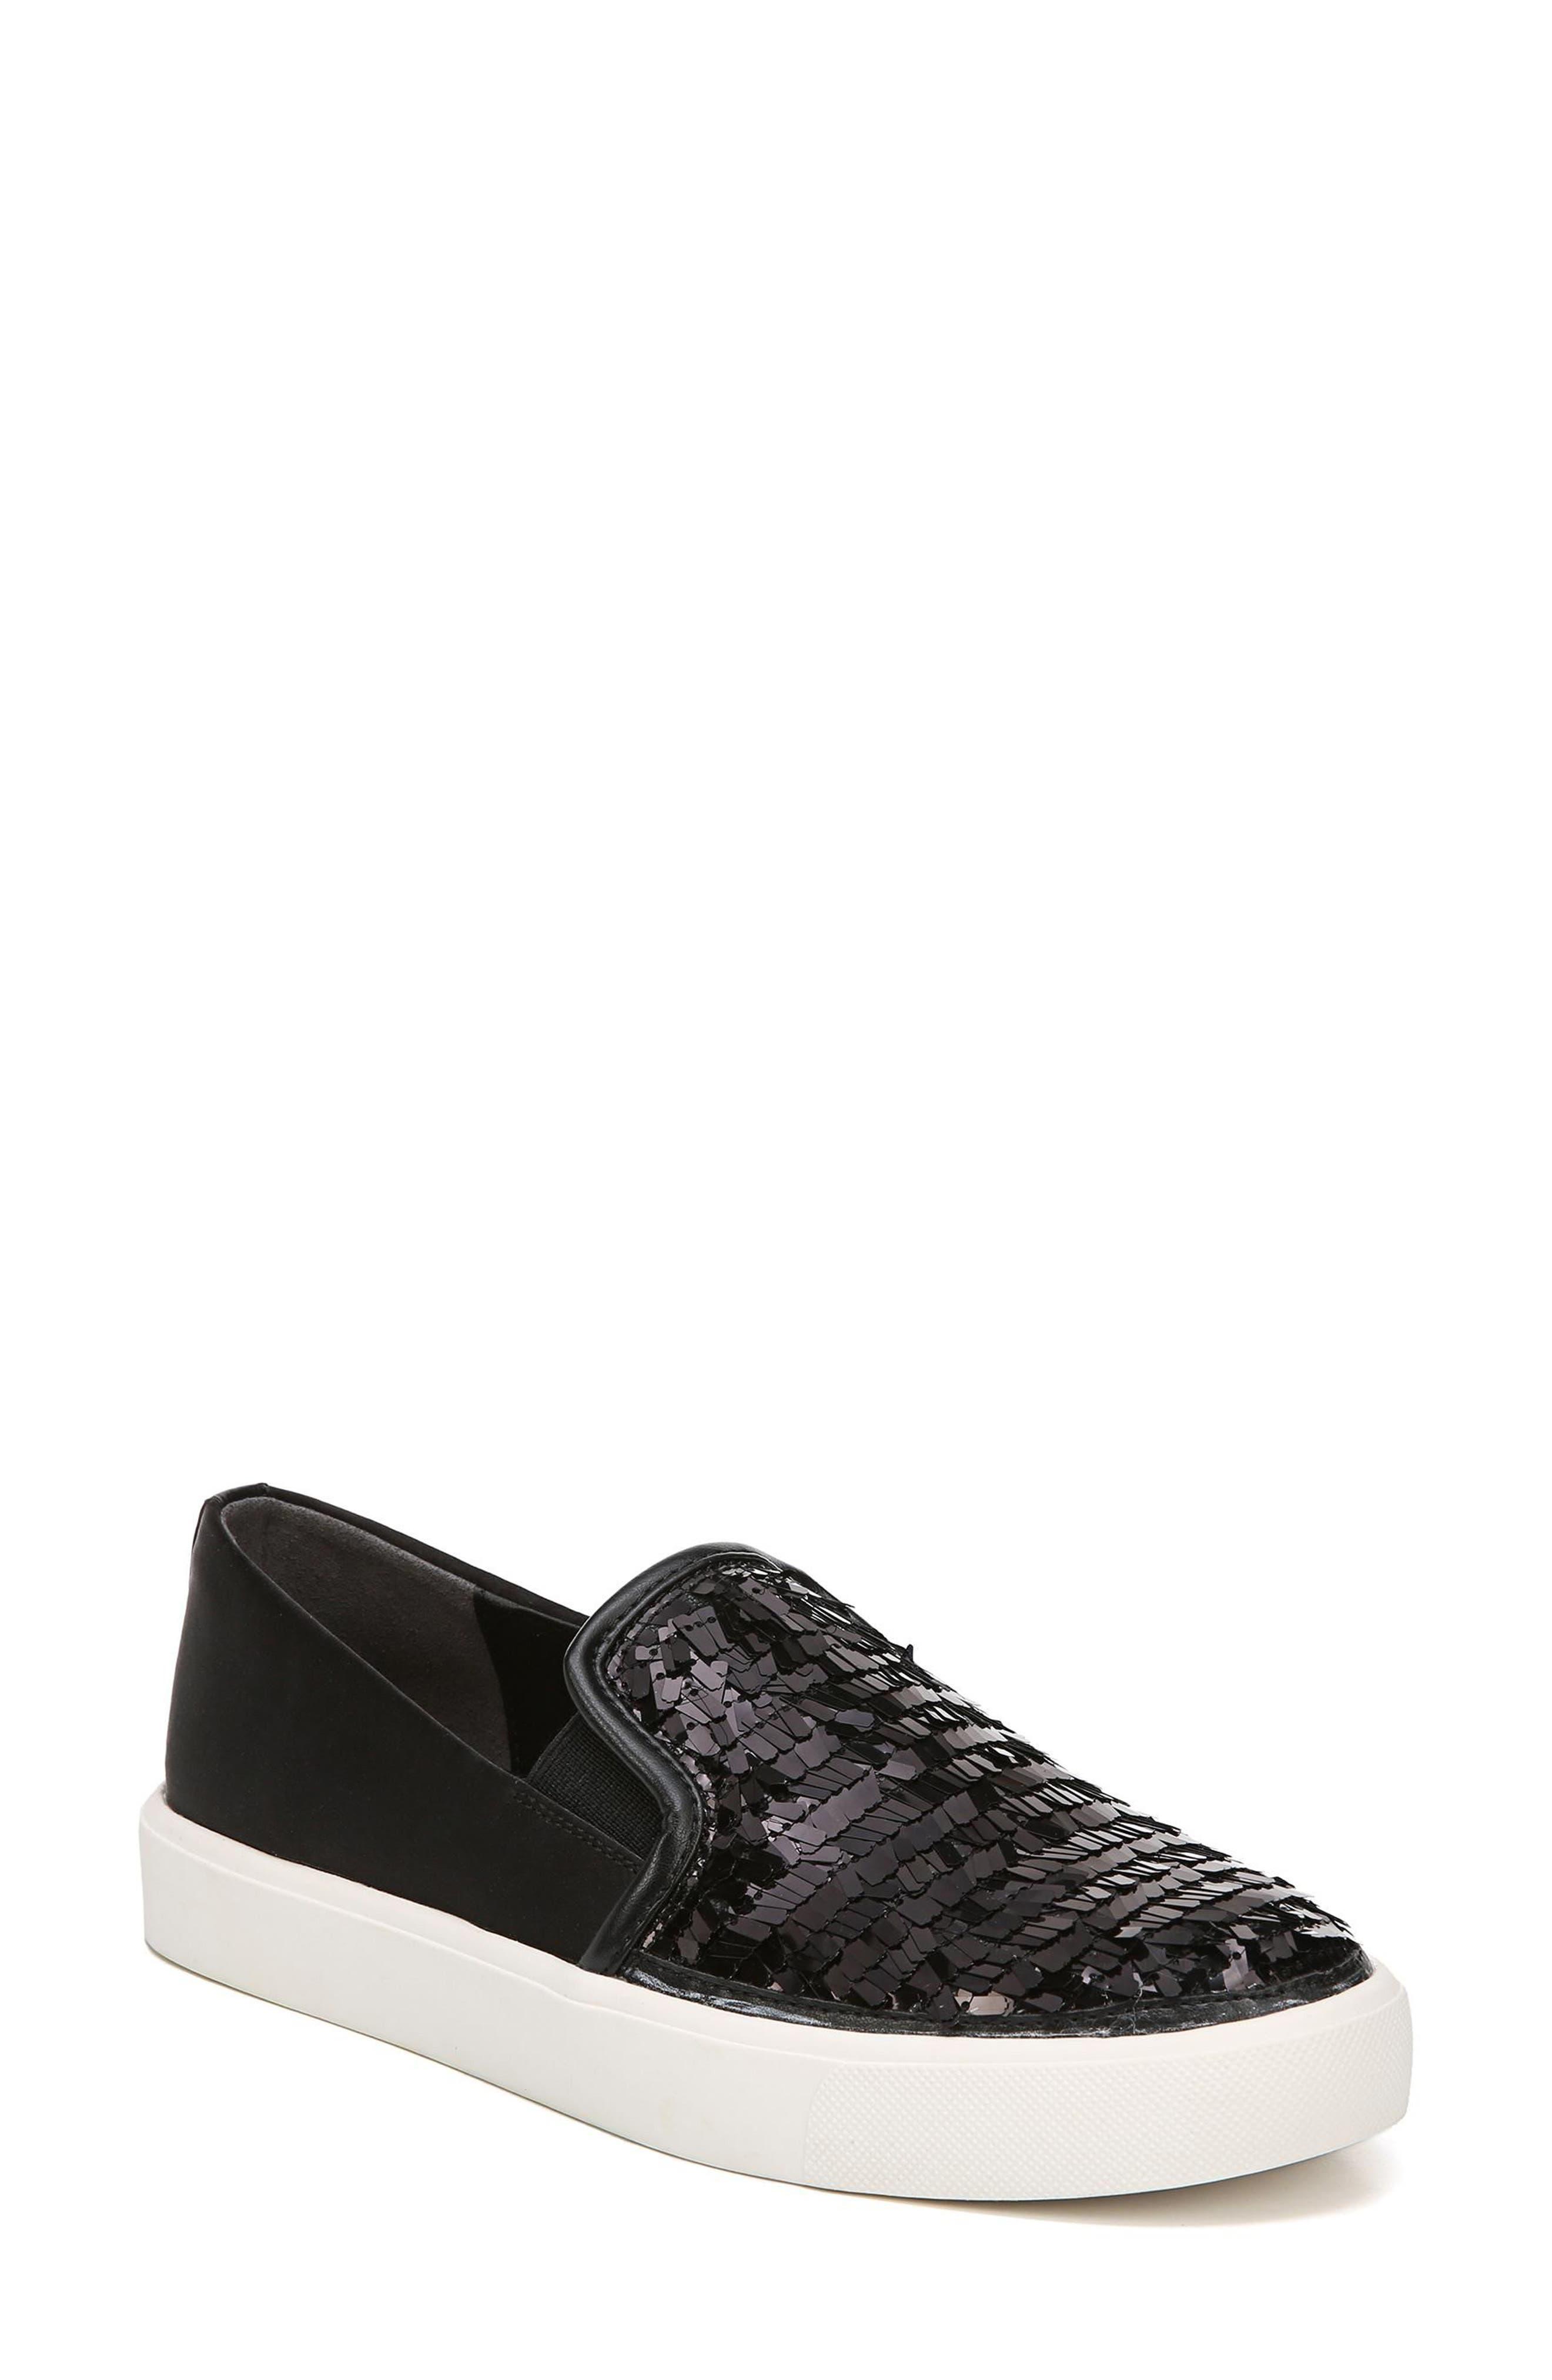 SAM EDELMAN Elton Slip-On Sneaker, Main, color, 002